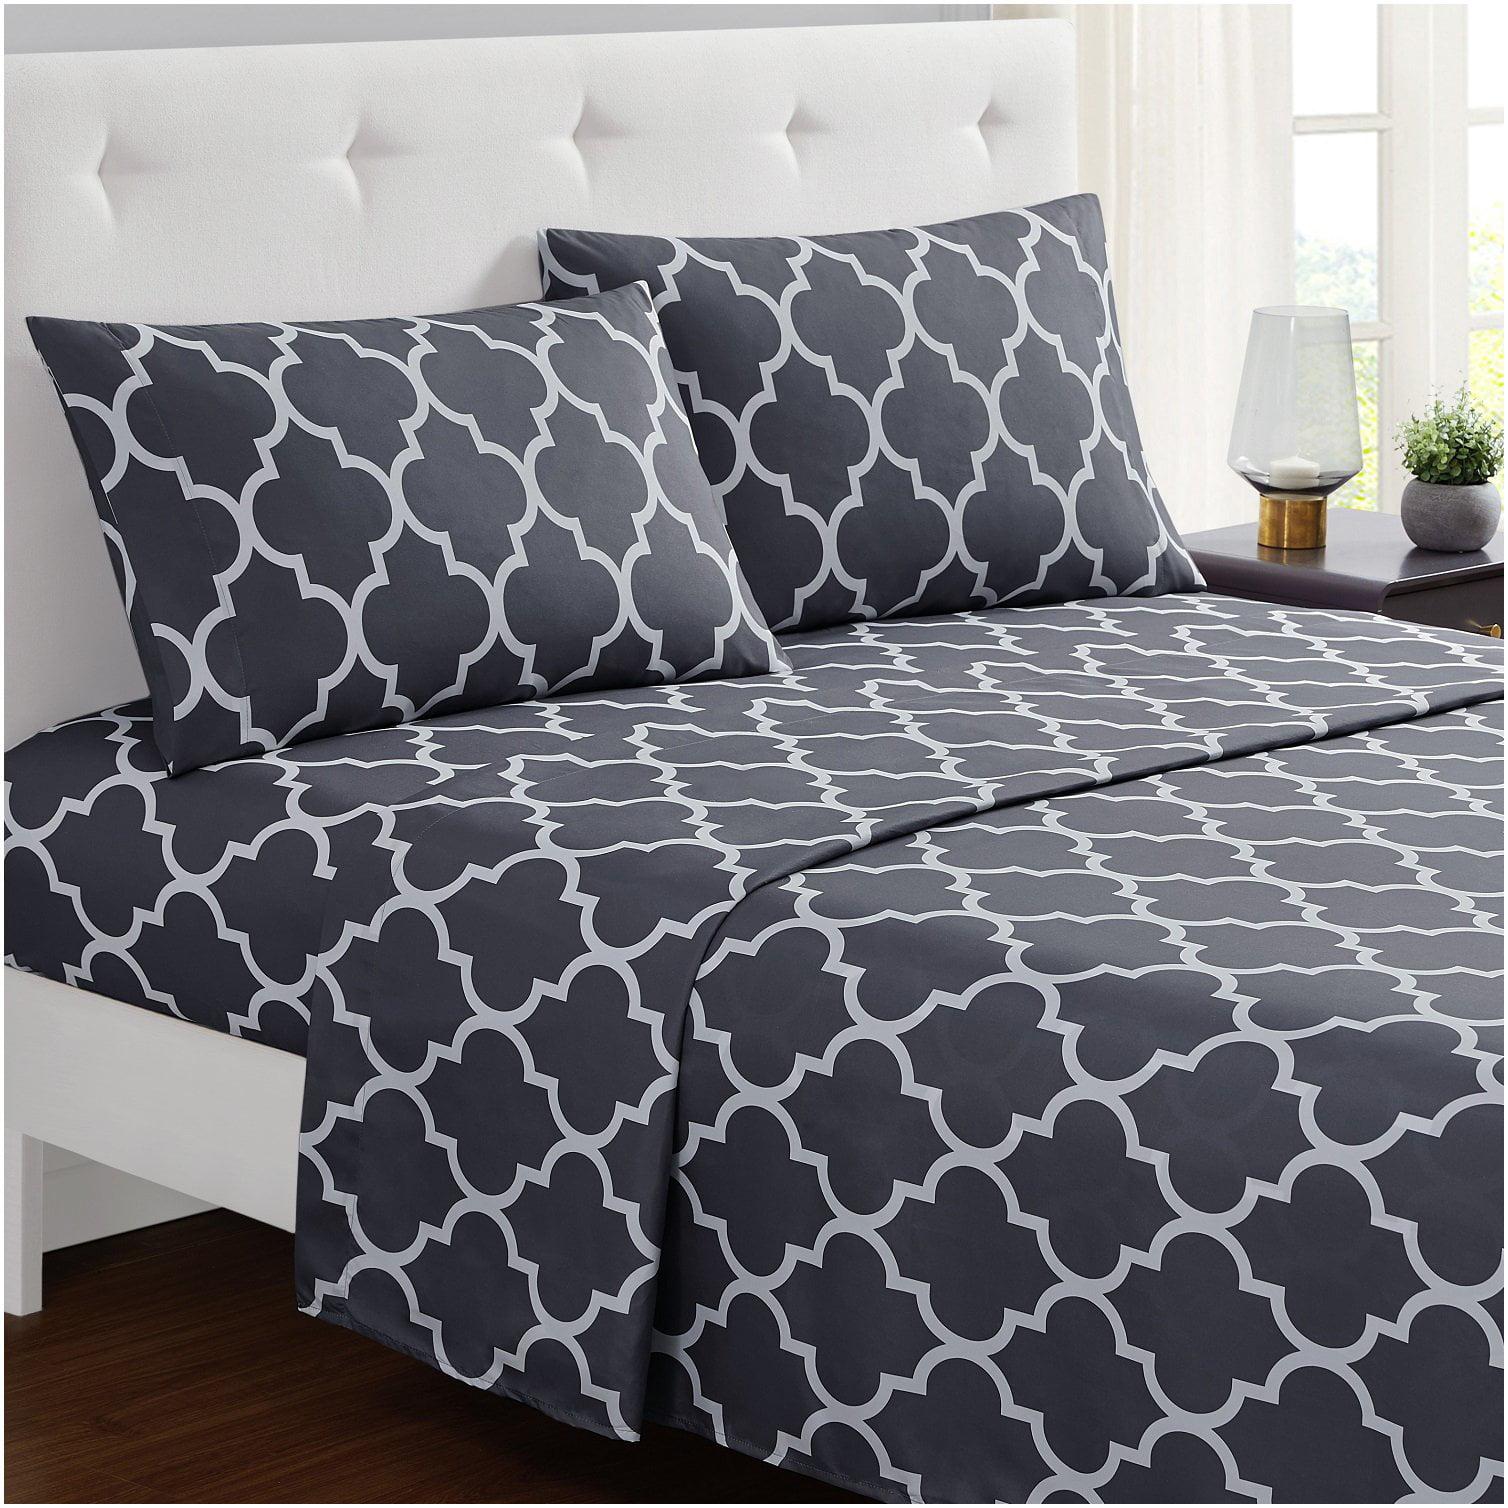 Wrinkle Stain Resistant Microfiber Deep Pocket Mellanni 4-Piece Bed Sheet Set